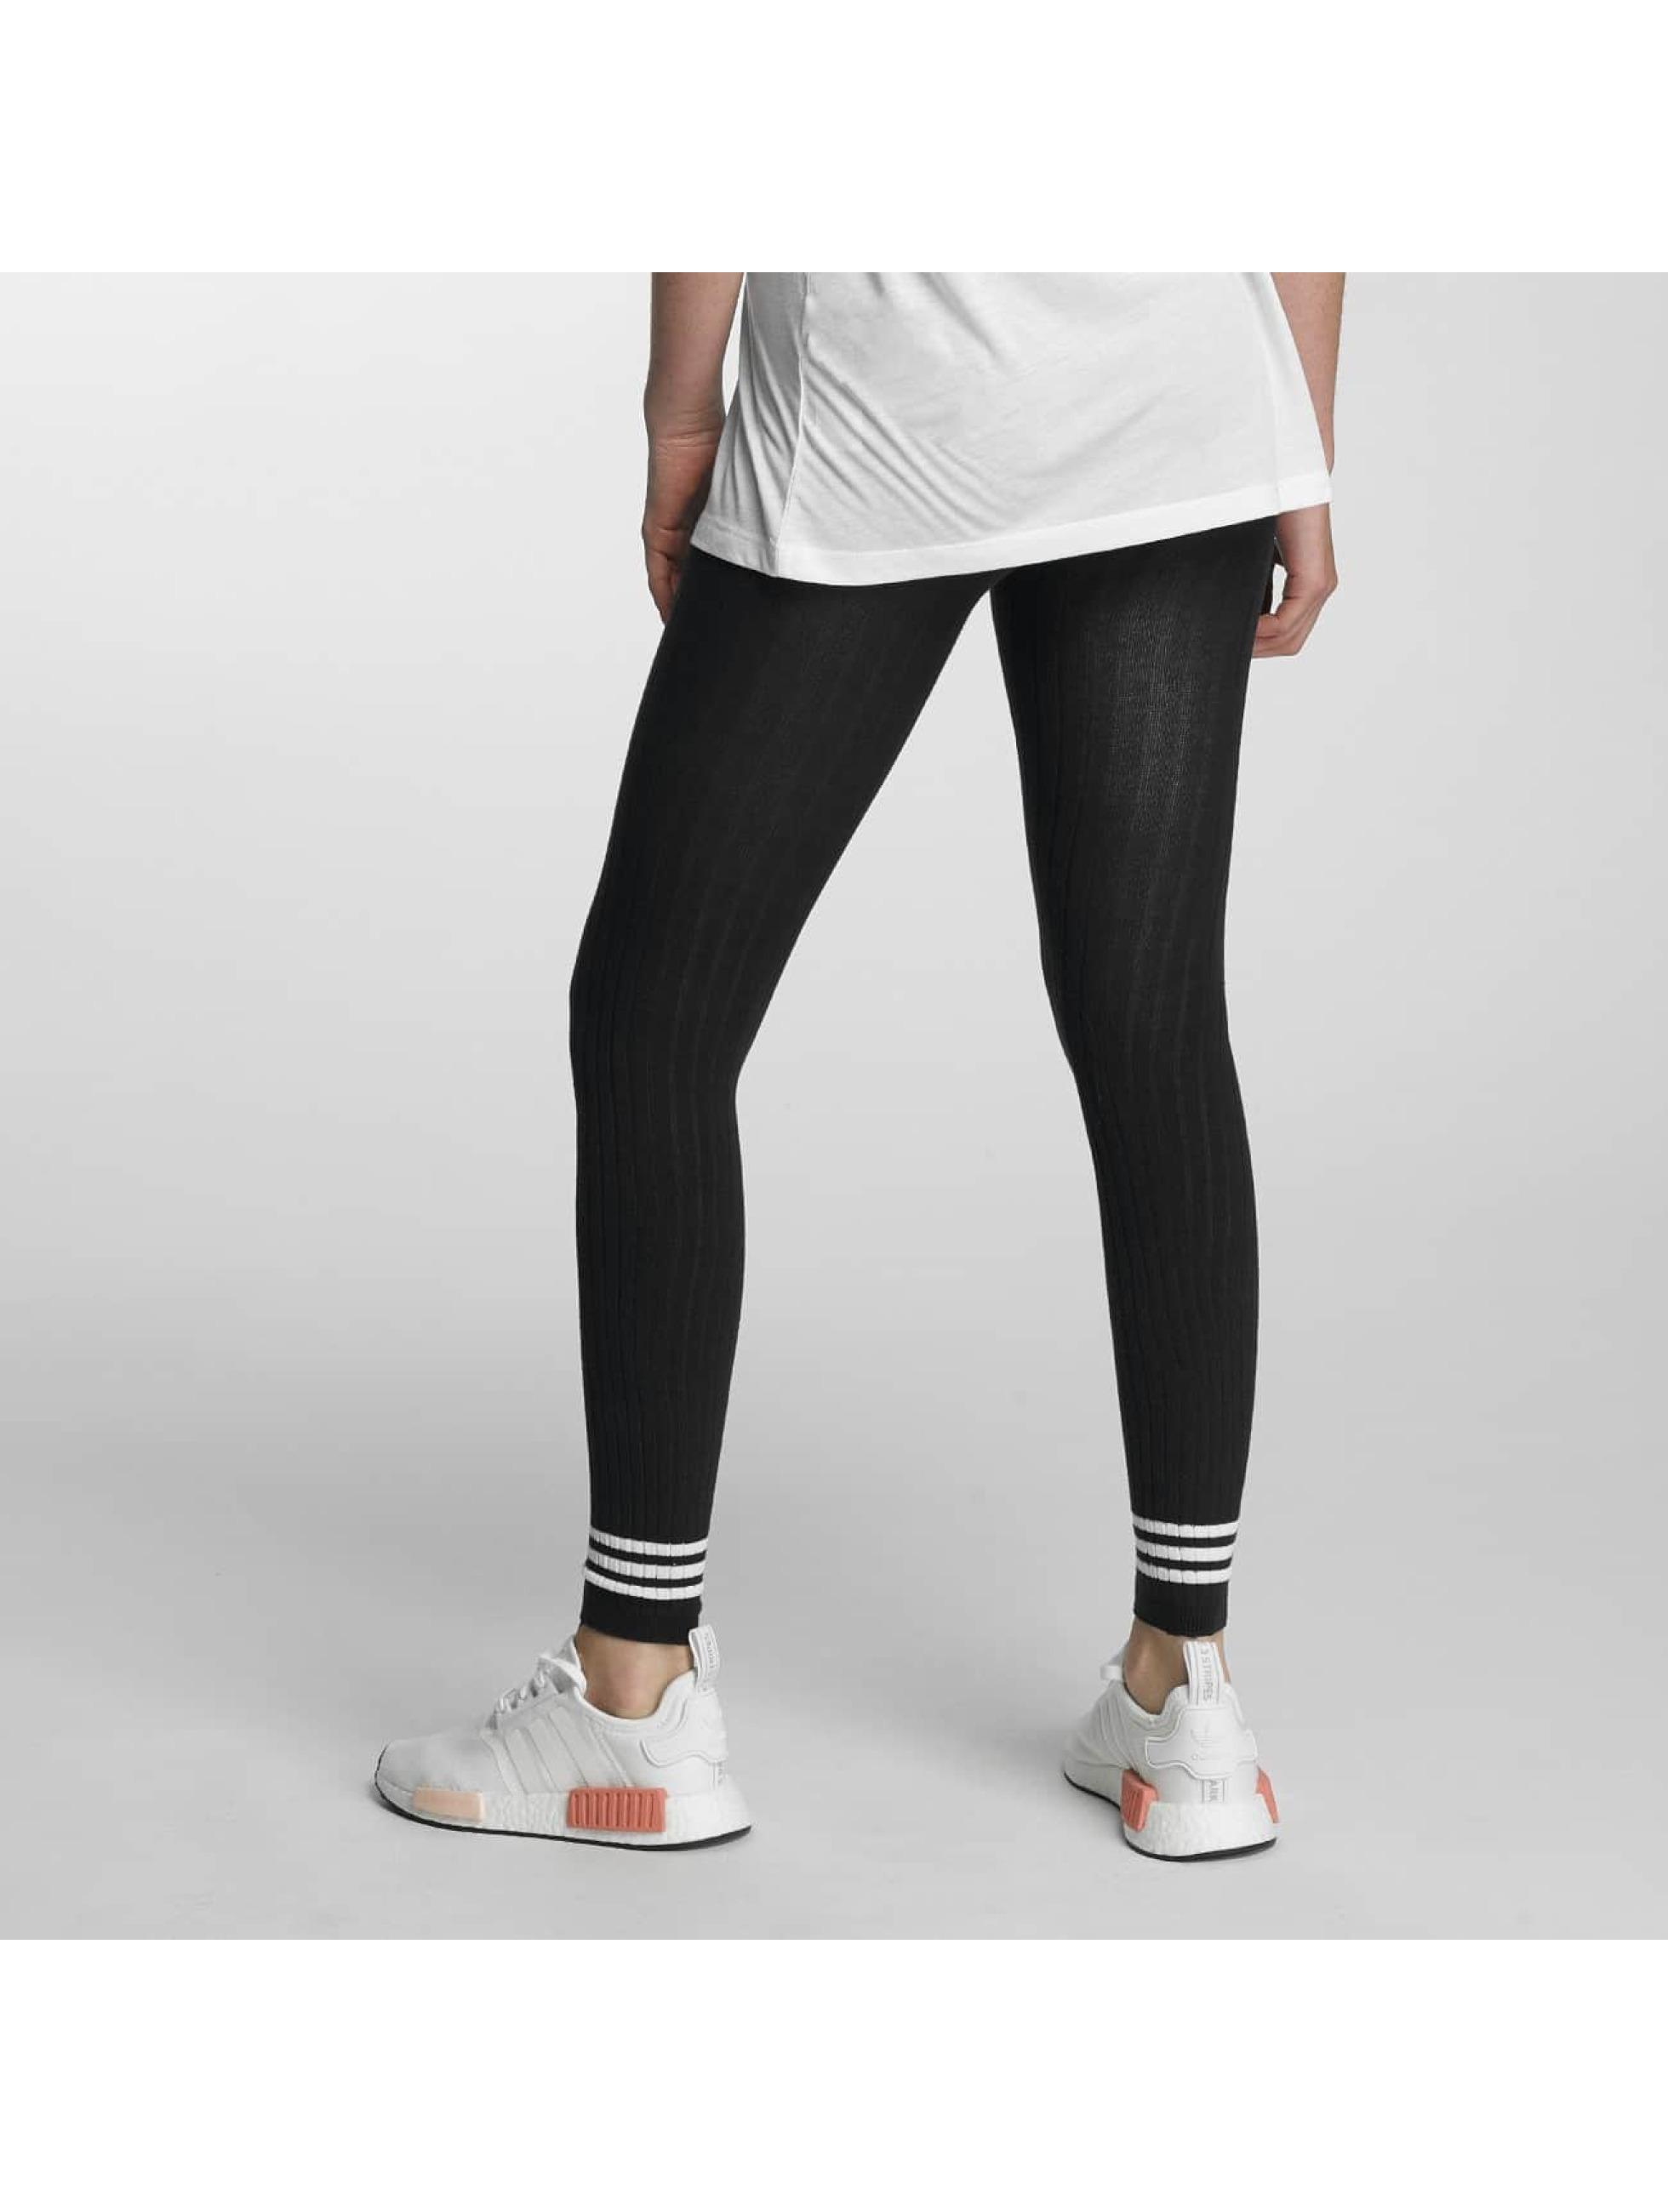 adidas originals Leggings/Treggings 3 Stripes niebieski